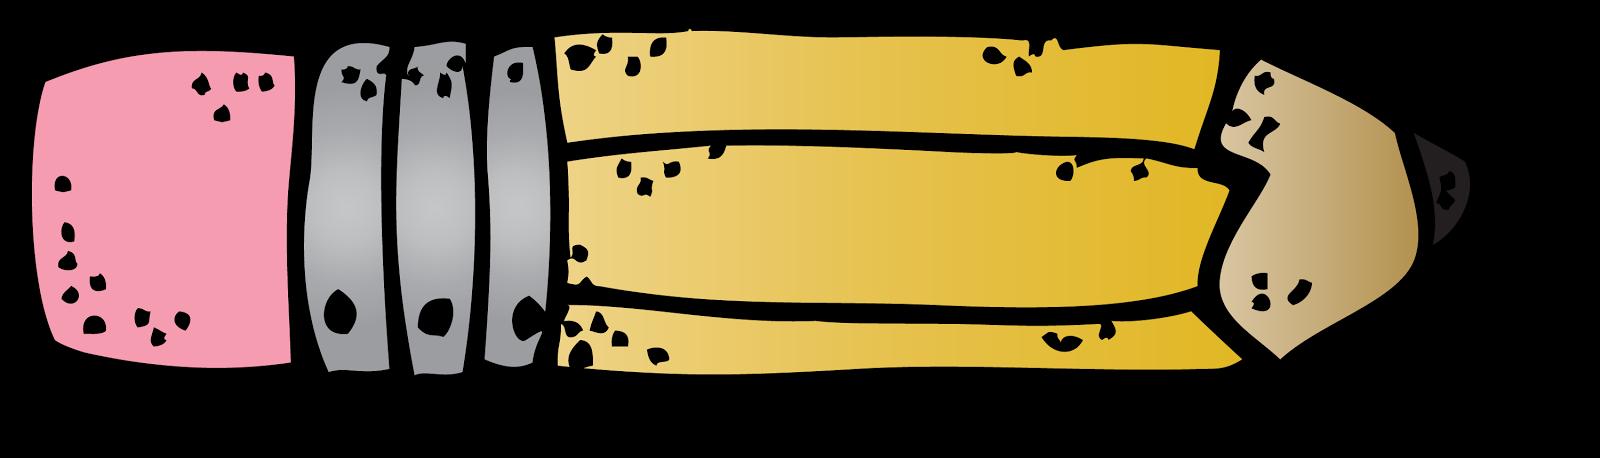 Melonheadz Pencil Clipart.